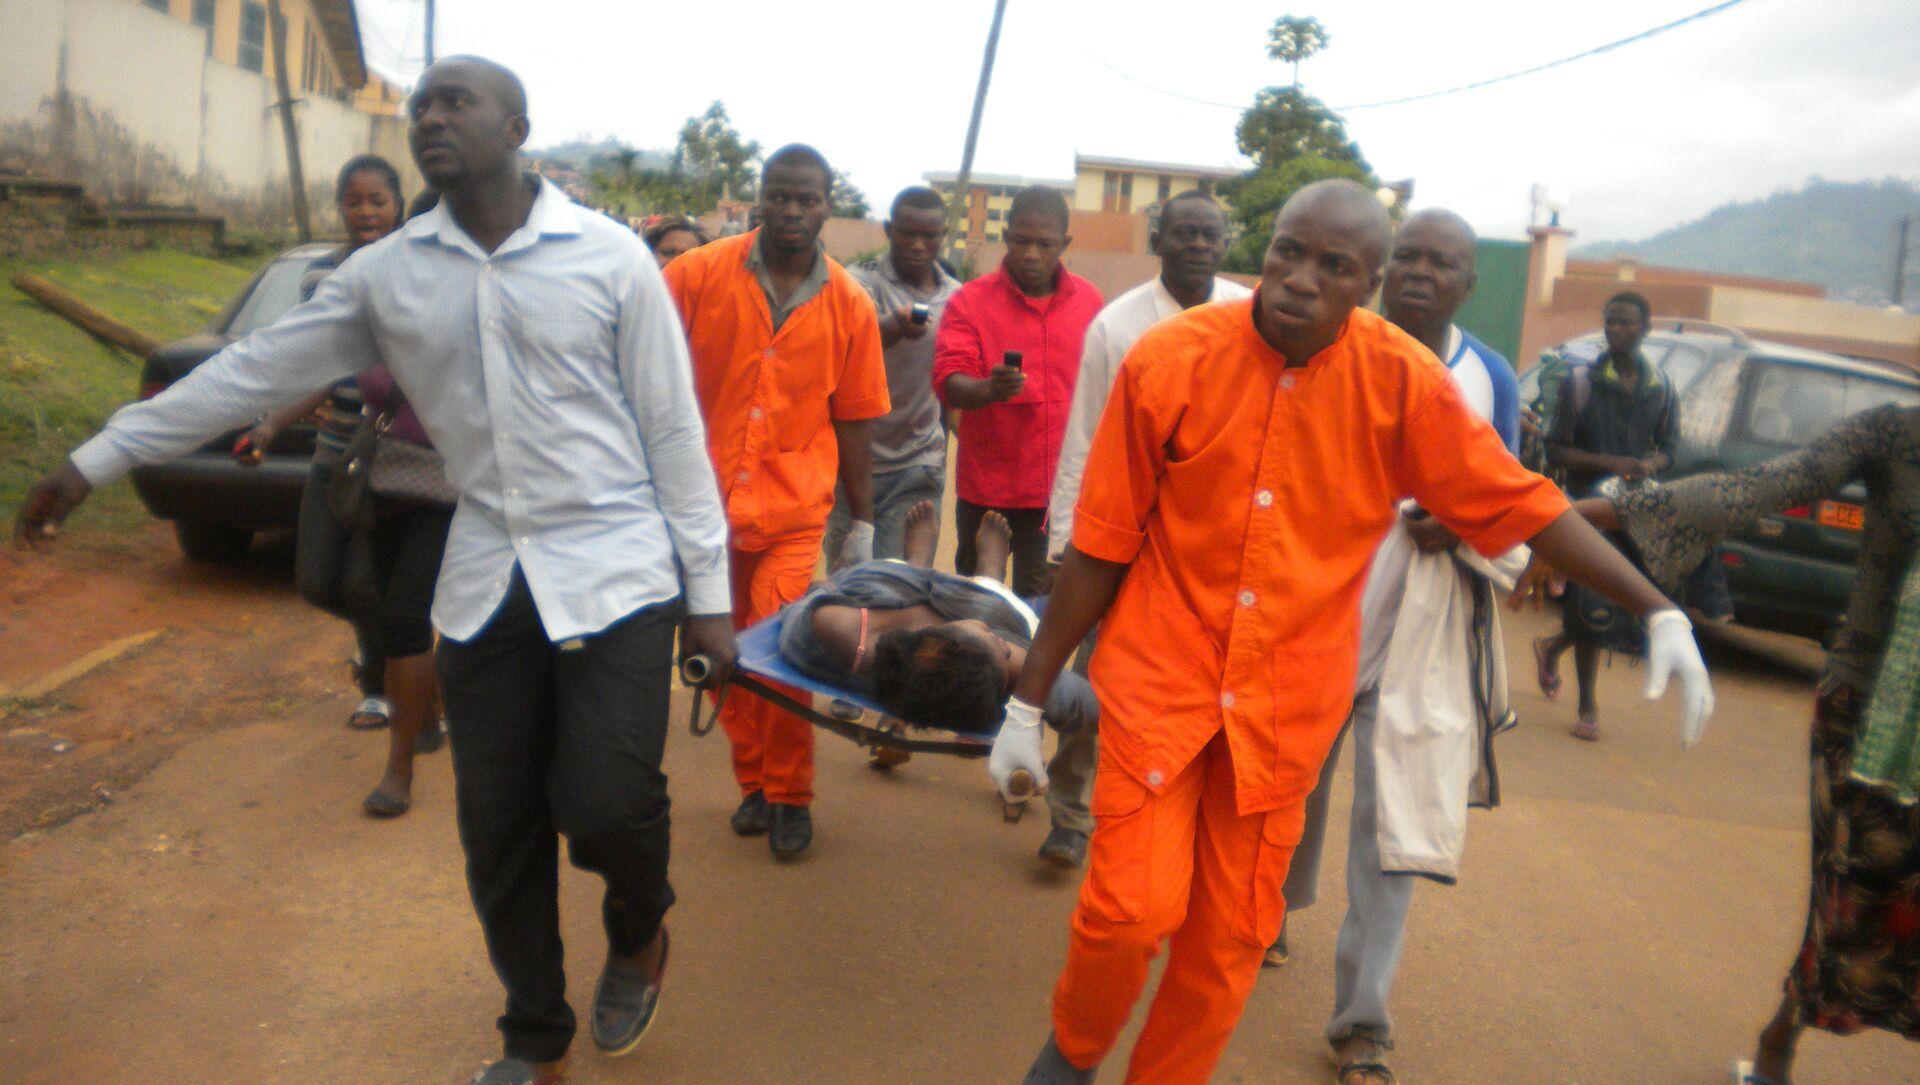 Cameroon Medics evacuate the body (File) - Sputnik International, 1920, 02.08.2021